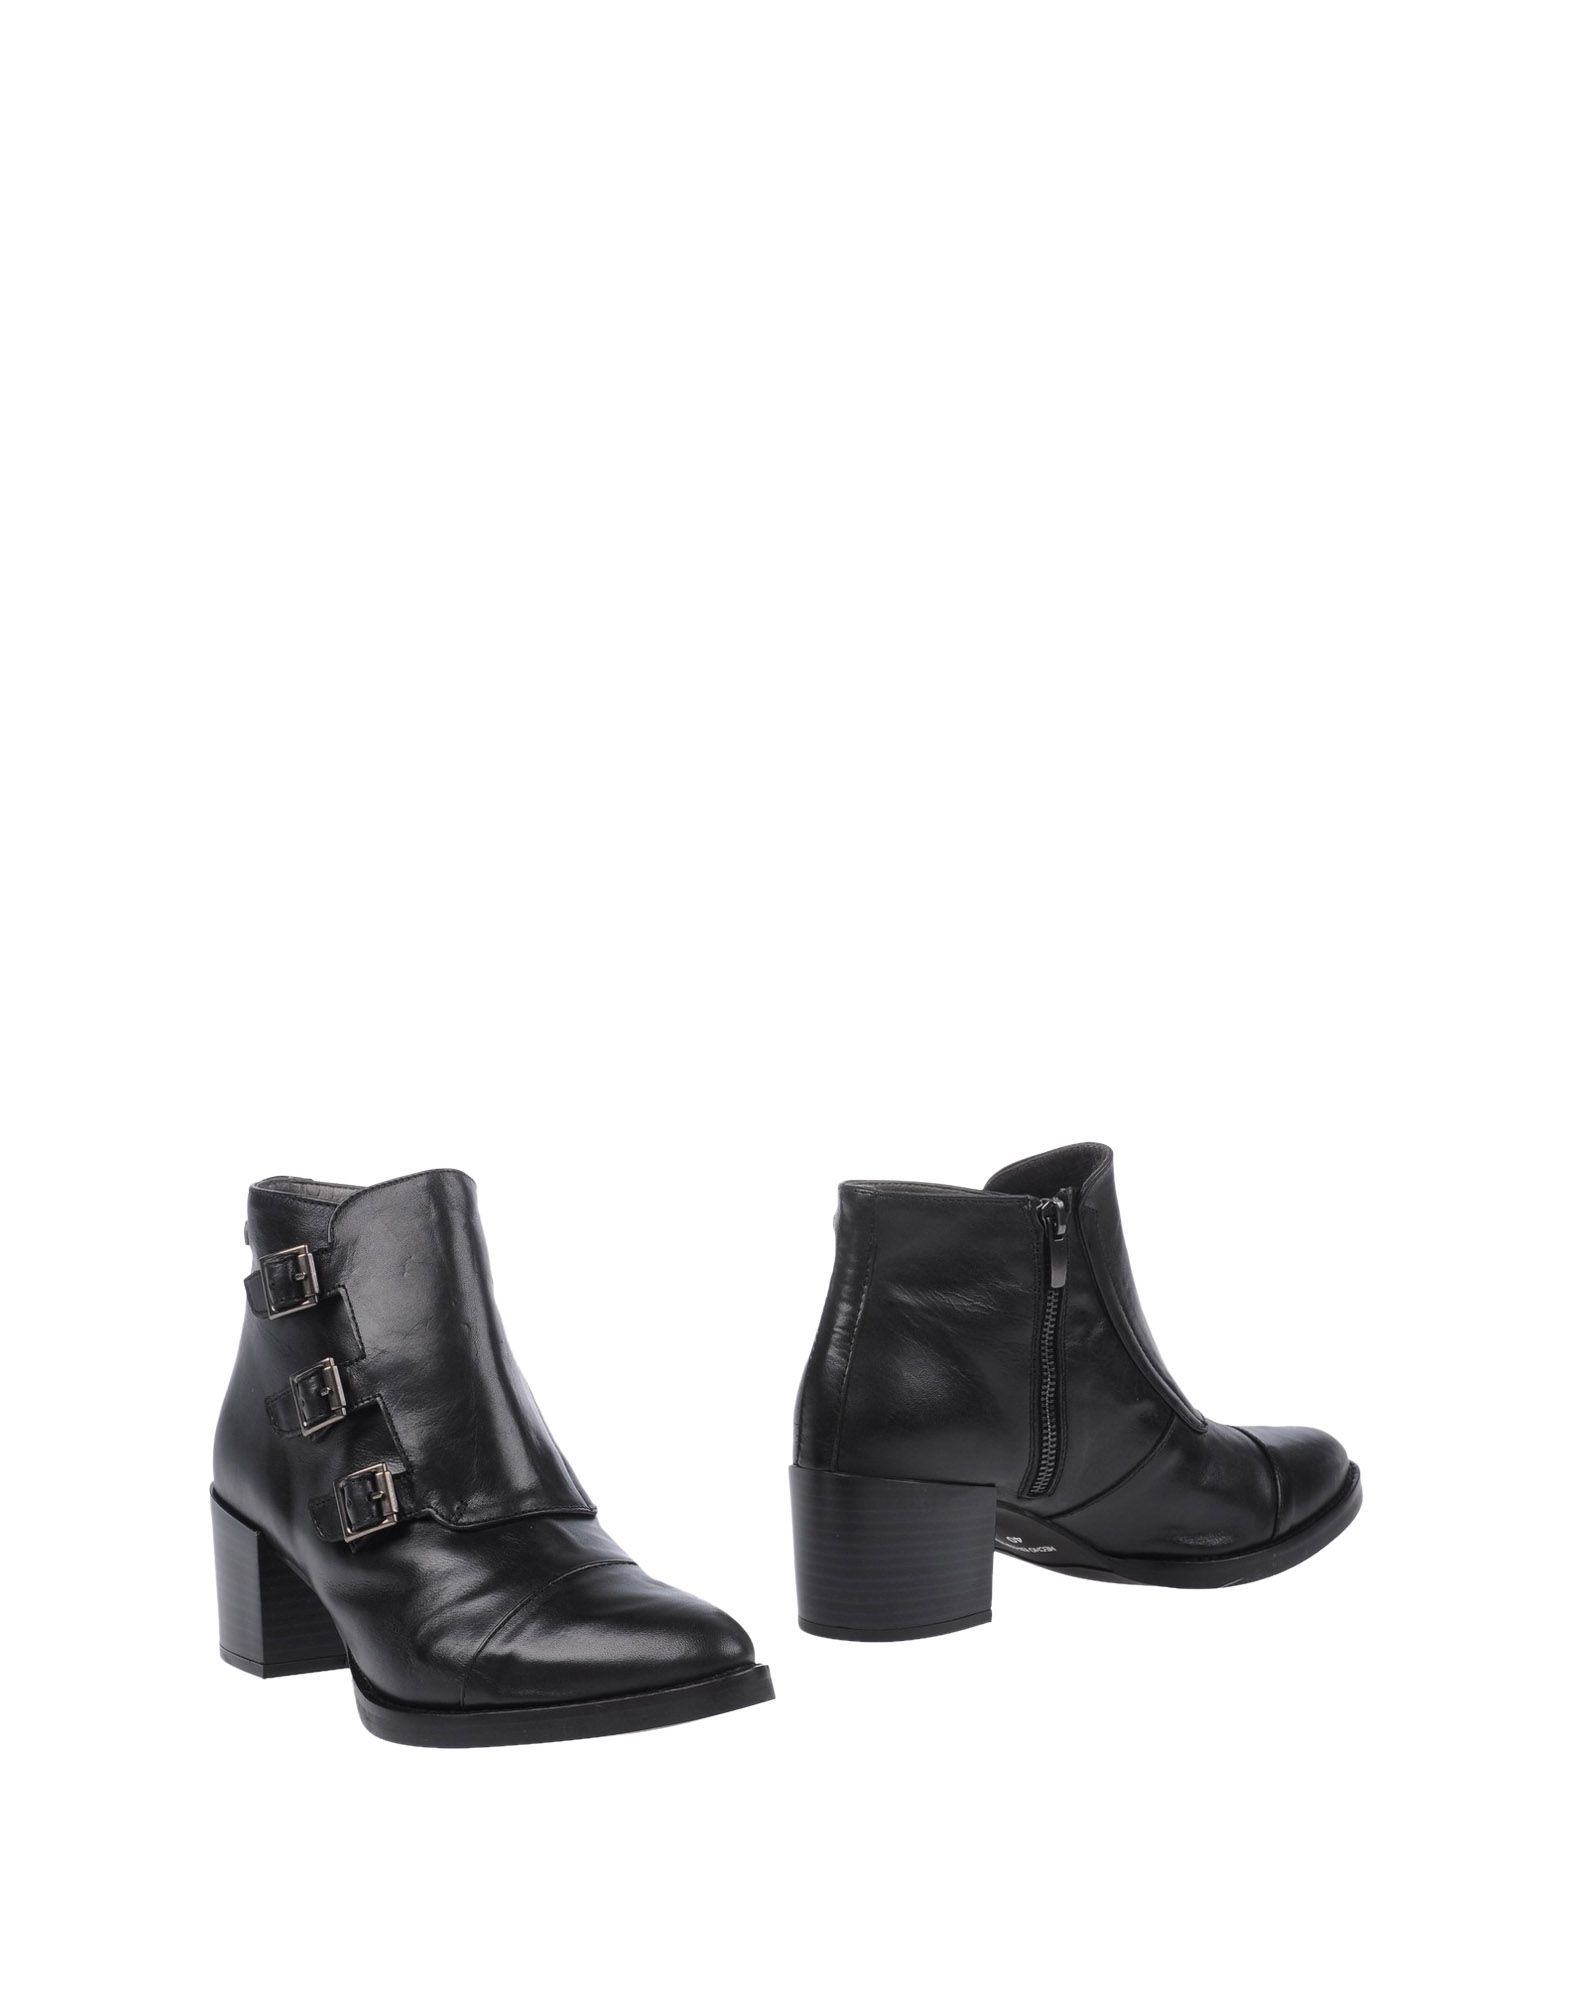 DB by D'BUZZ Полусапоги и высокие ботинки si by sinela полусапоги и высокие ботинки